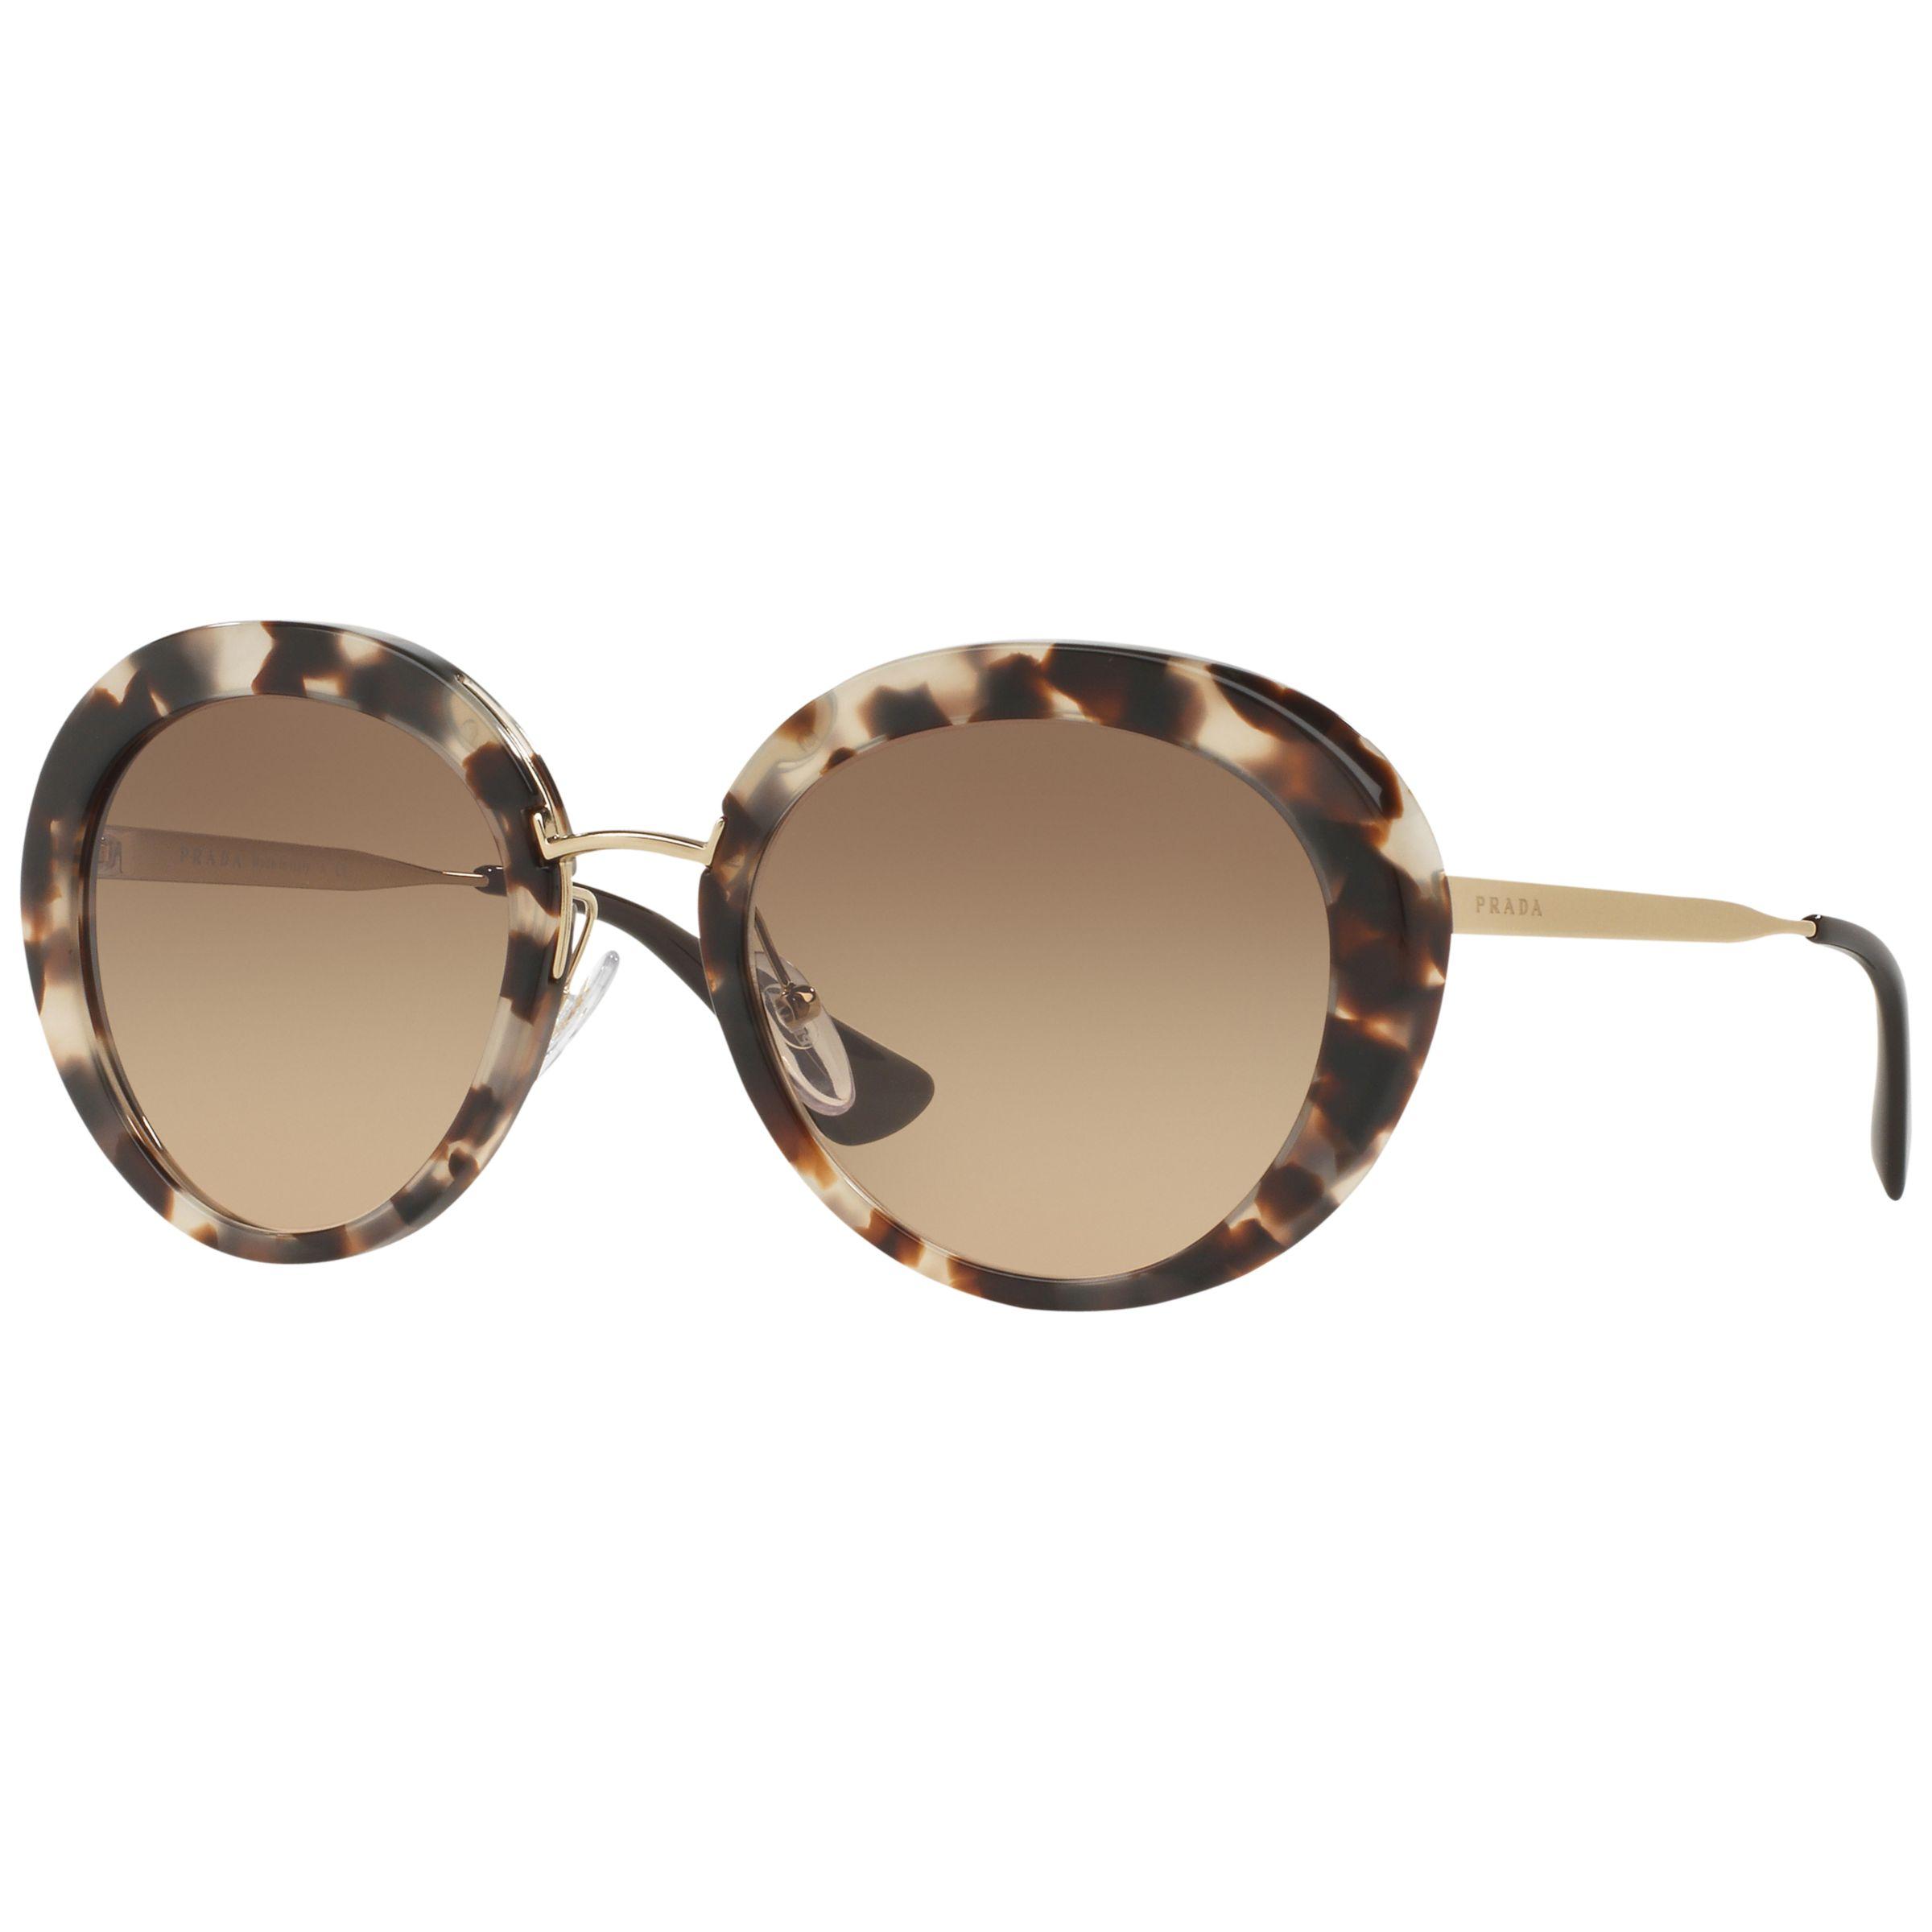 db802230e64b Prada PR16QS Cinema Oval Sunglasses, Havana at John Lewis & Partners